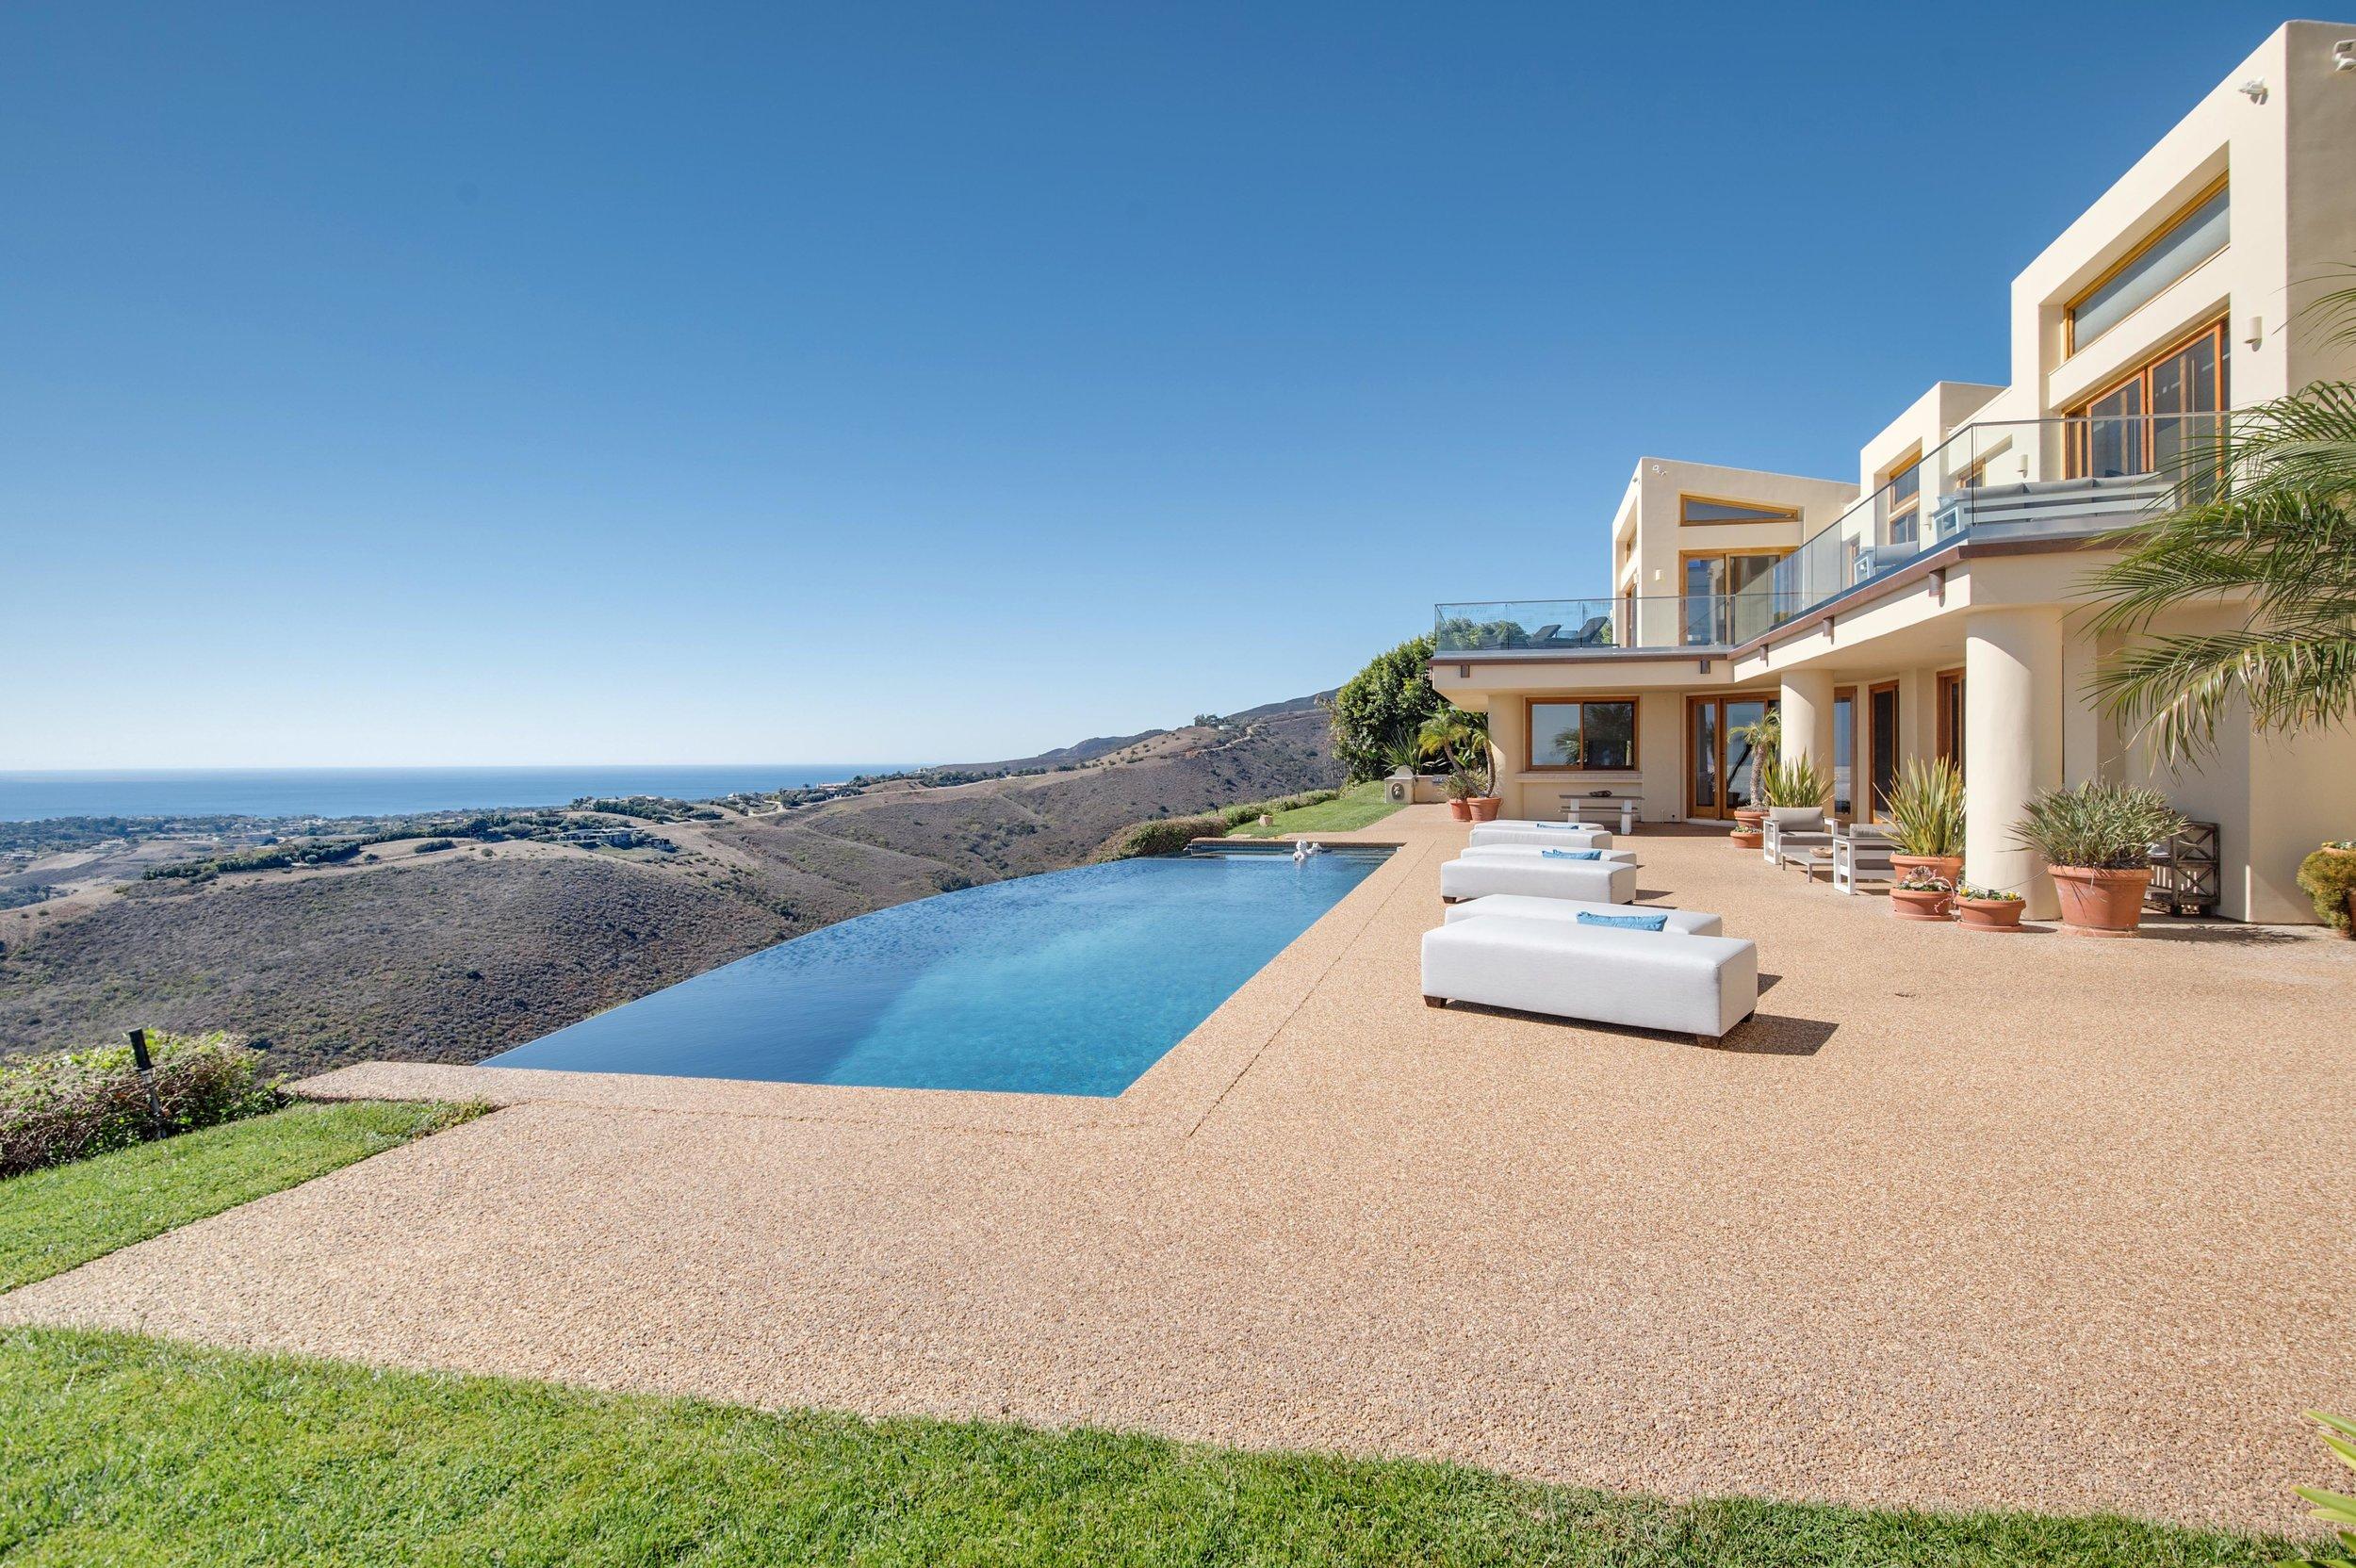 029 Pool Ocean View 27475 Latigo Bay View Drive For Sale Lease The Malibu Life Team Luxury Real Estate.jpg